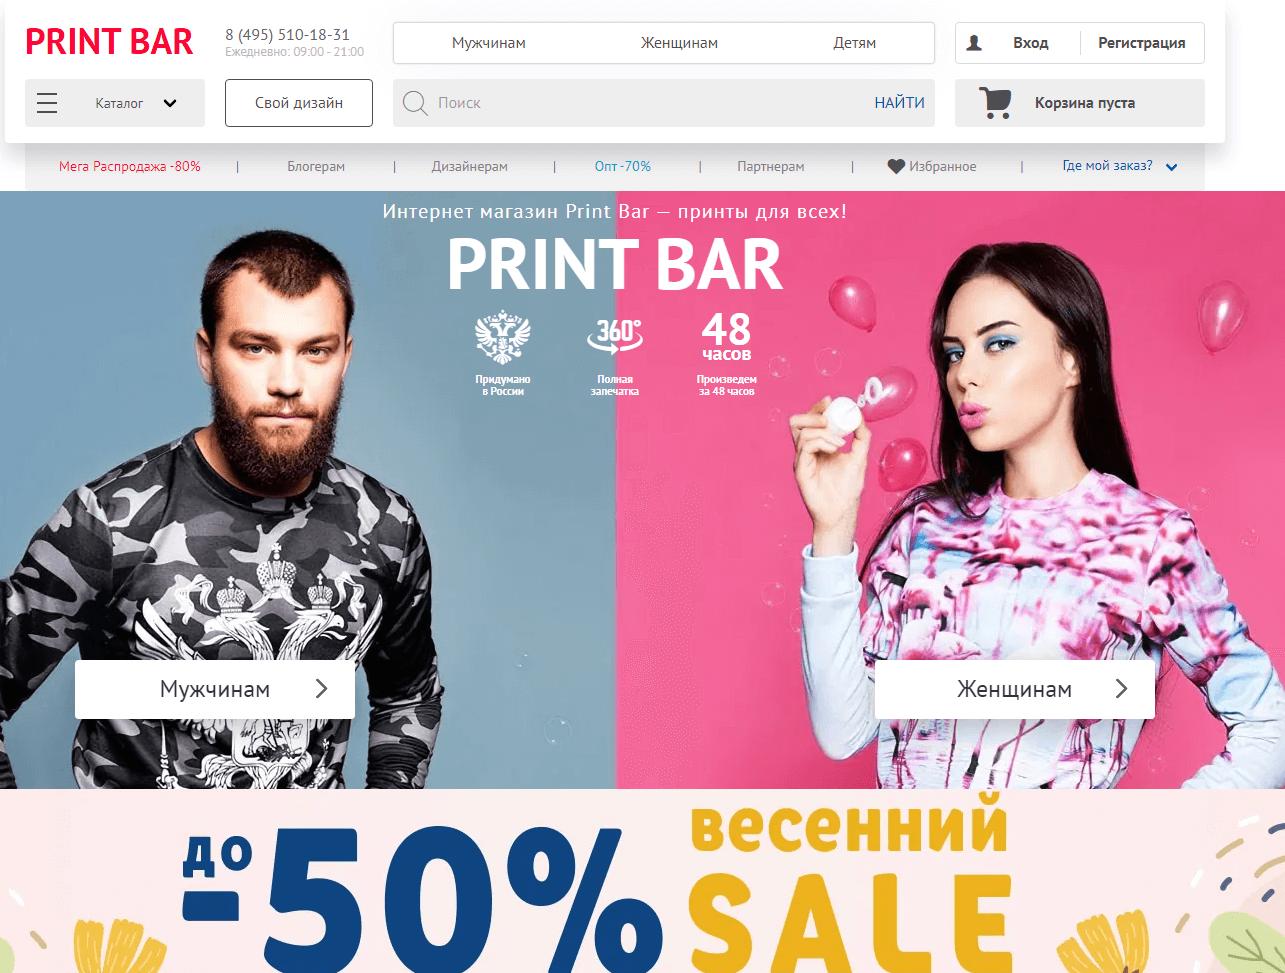 printbar.ru website